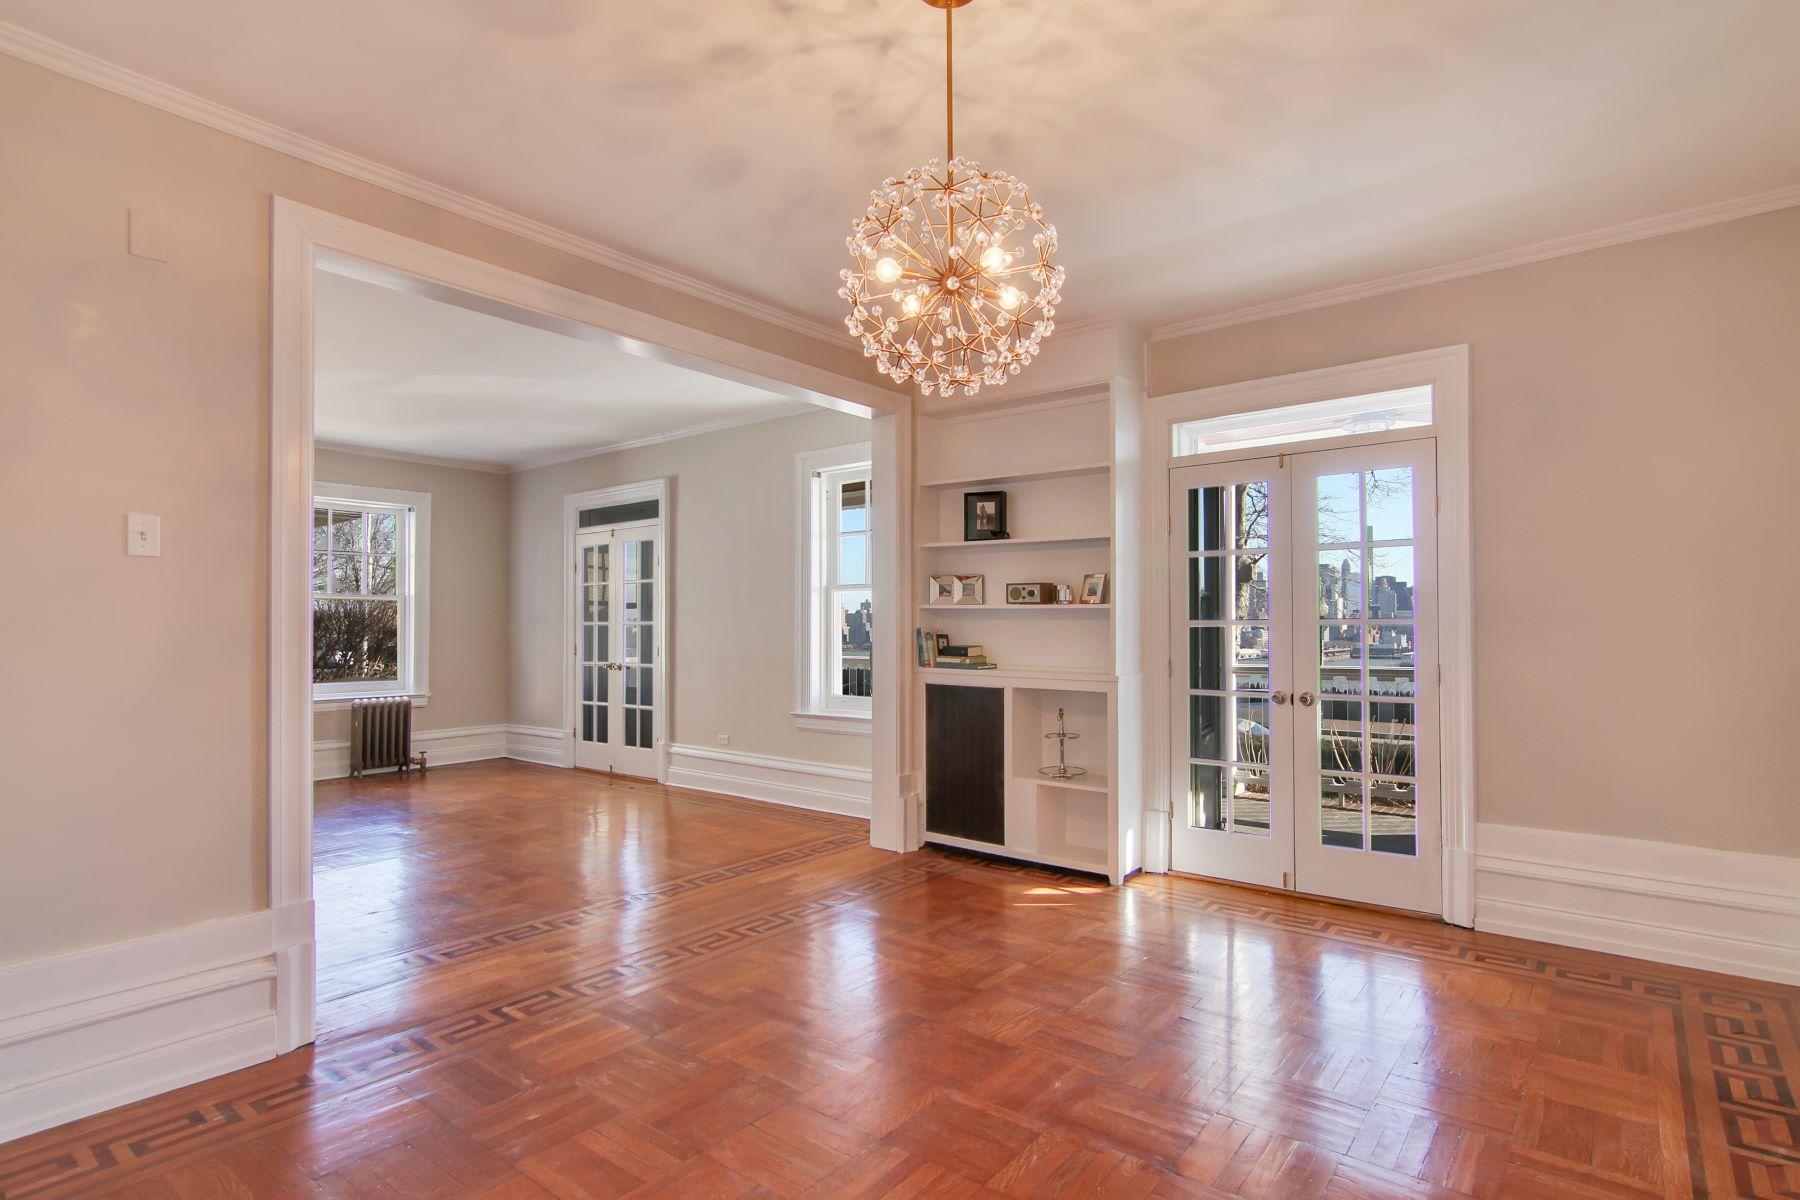 Condominium for Rent at 827 BLVD EAST, WEEHAWKEN NJ 827 BLVD East #1 Weehawken, New Jersey 07086 United States